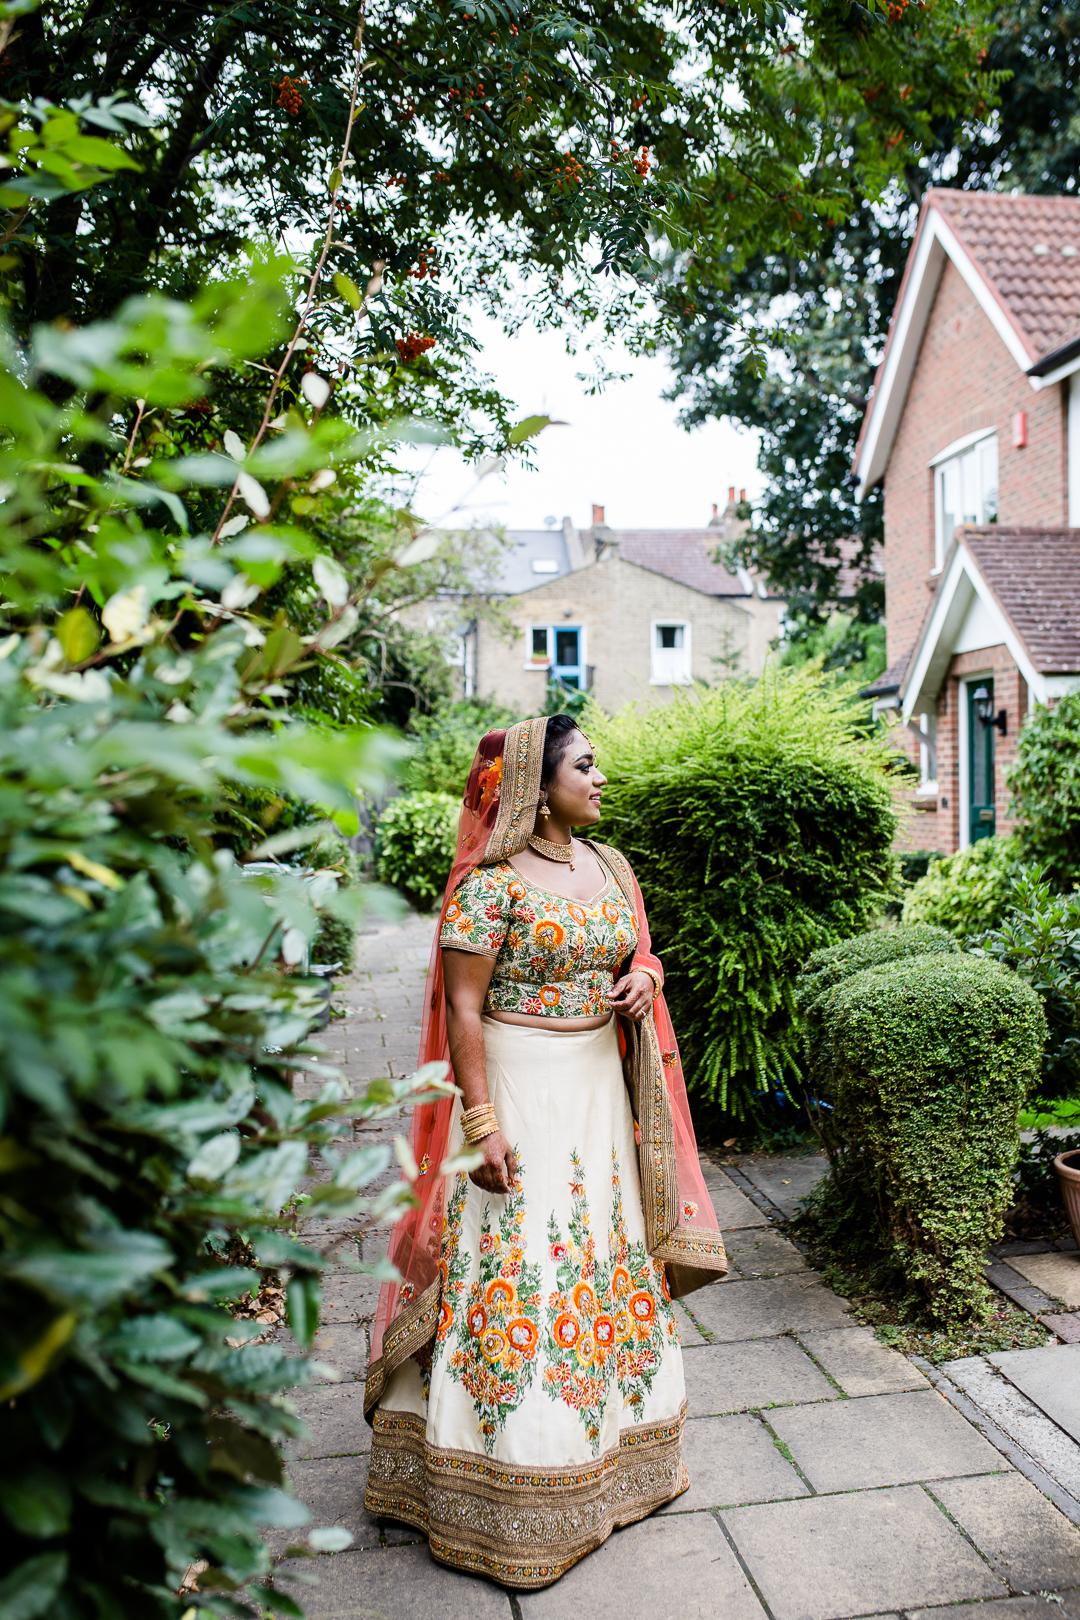 British Asian bride in sari for her wedding